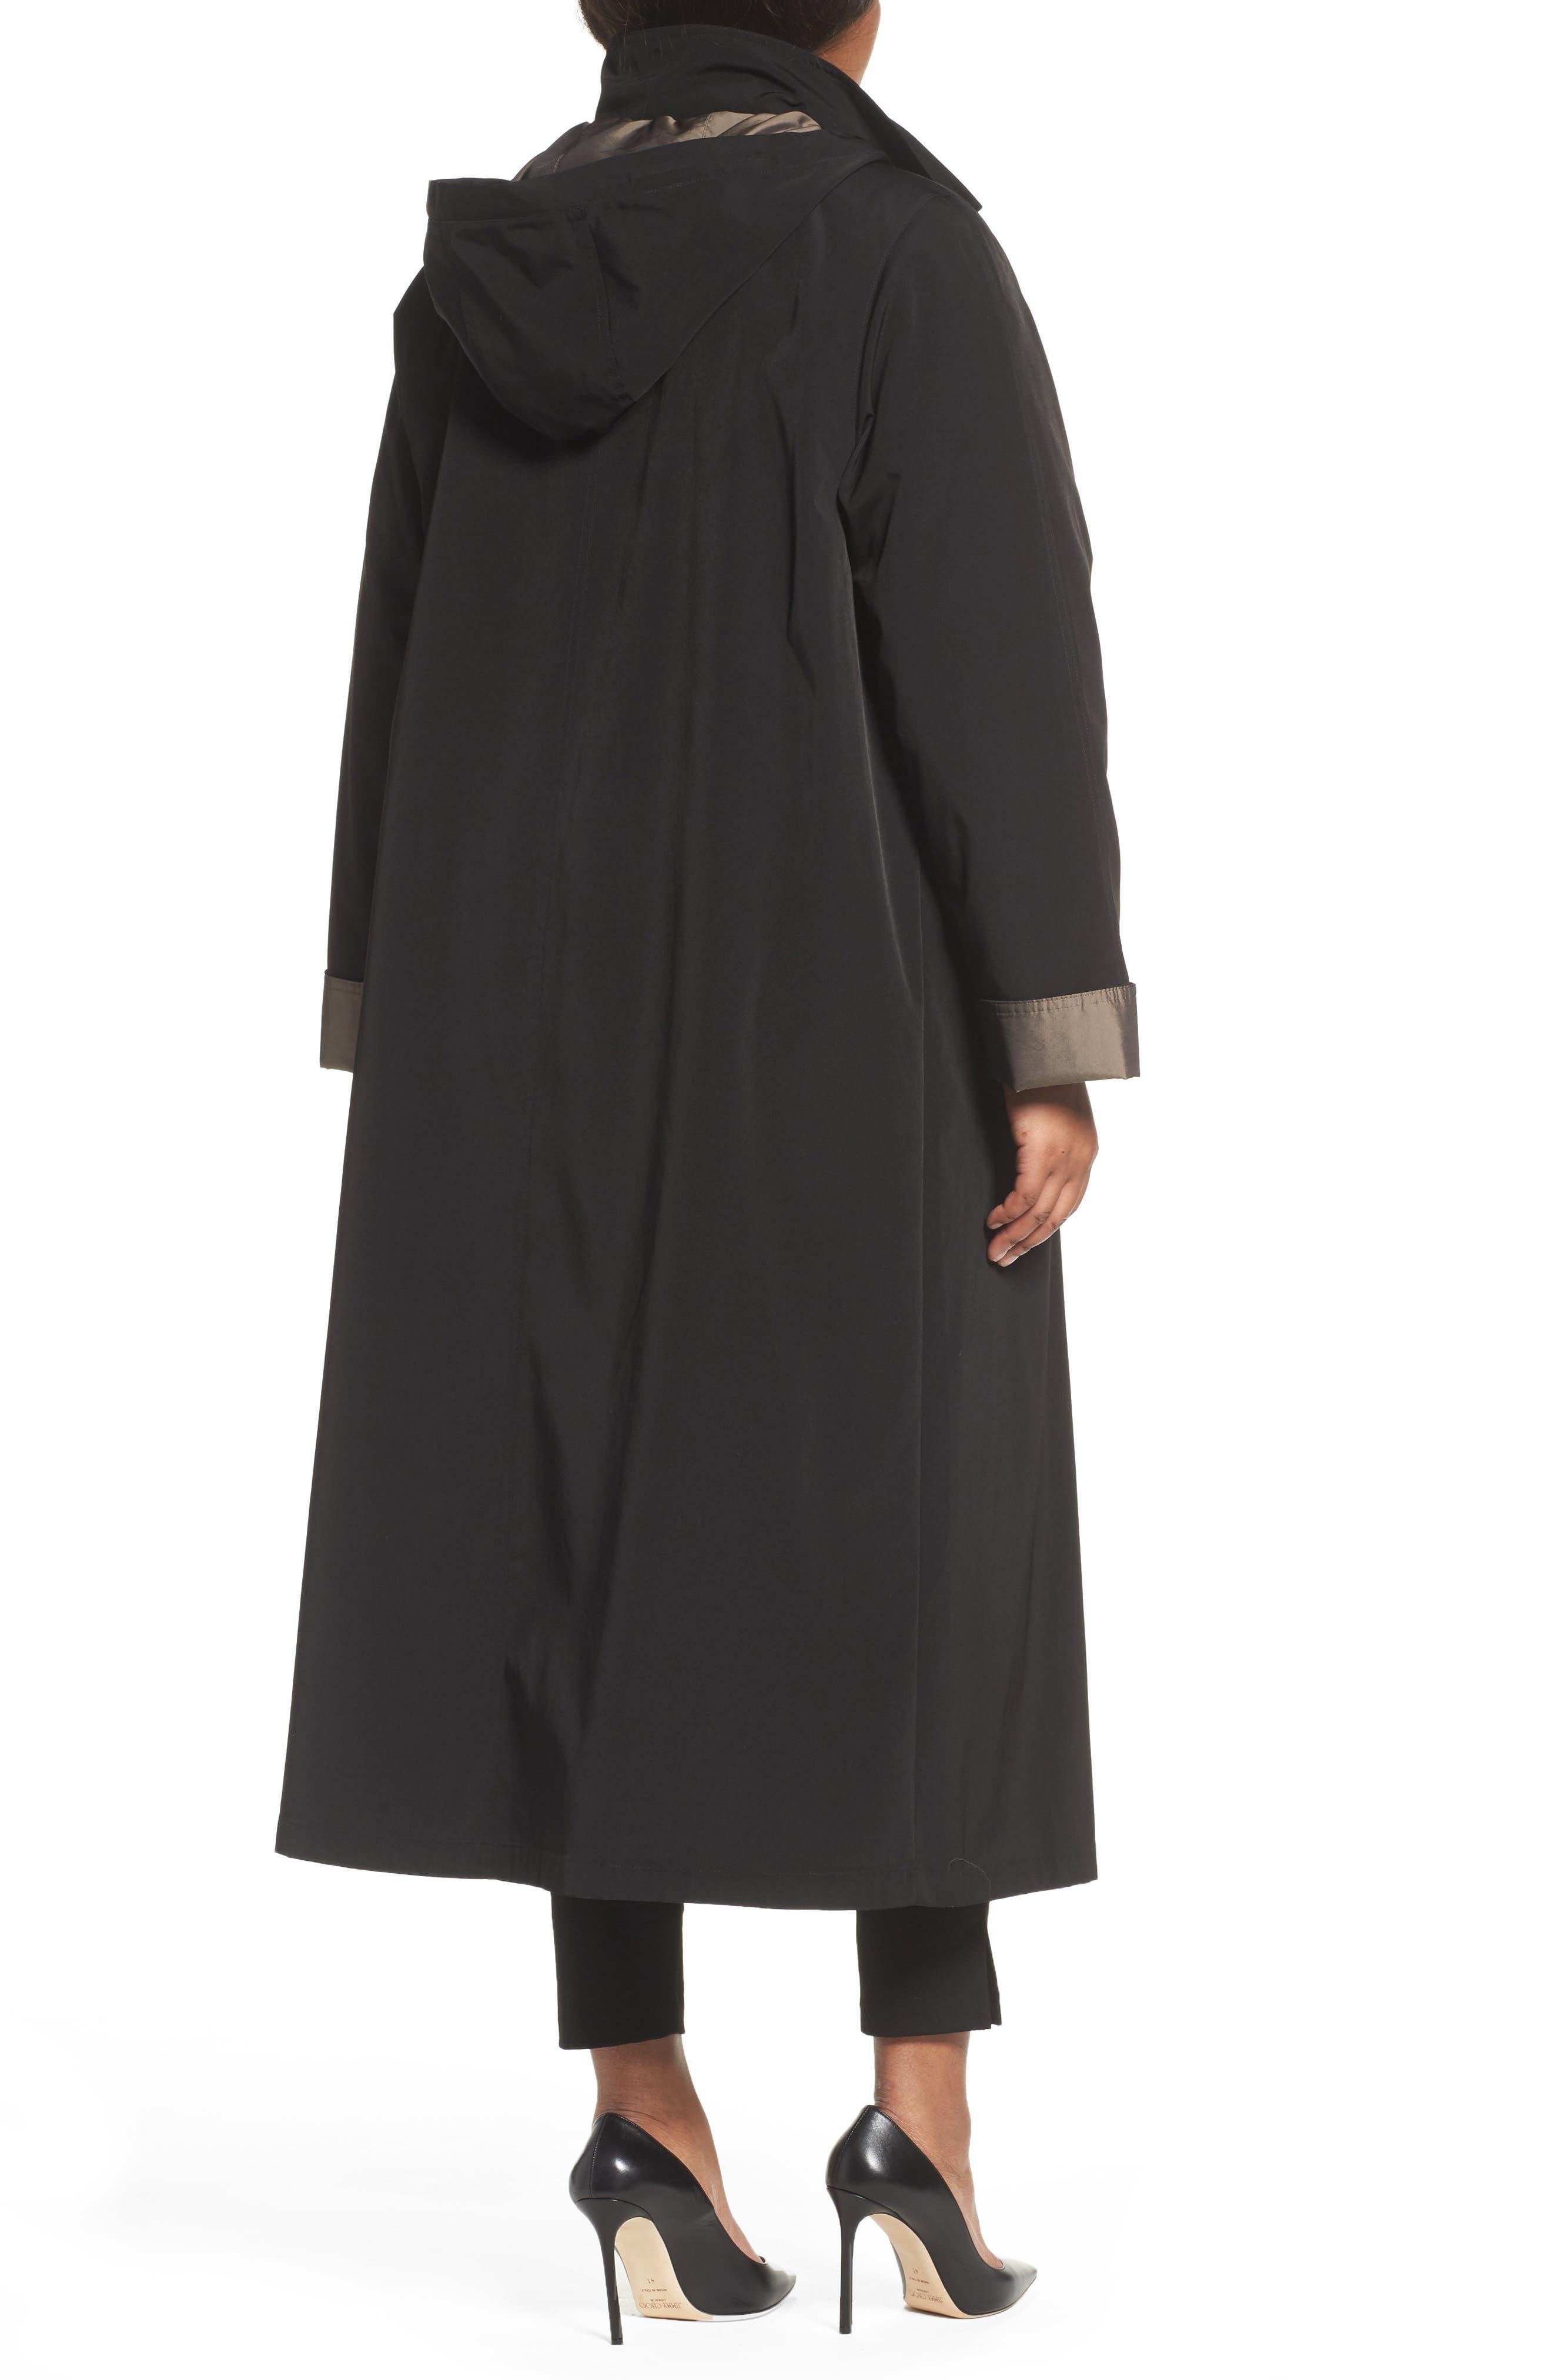 Long Raincoat with Detachable Hood & Liner,                             Alternate thumbnail 2, color,                             BLACK